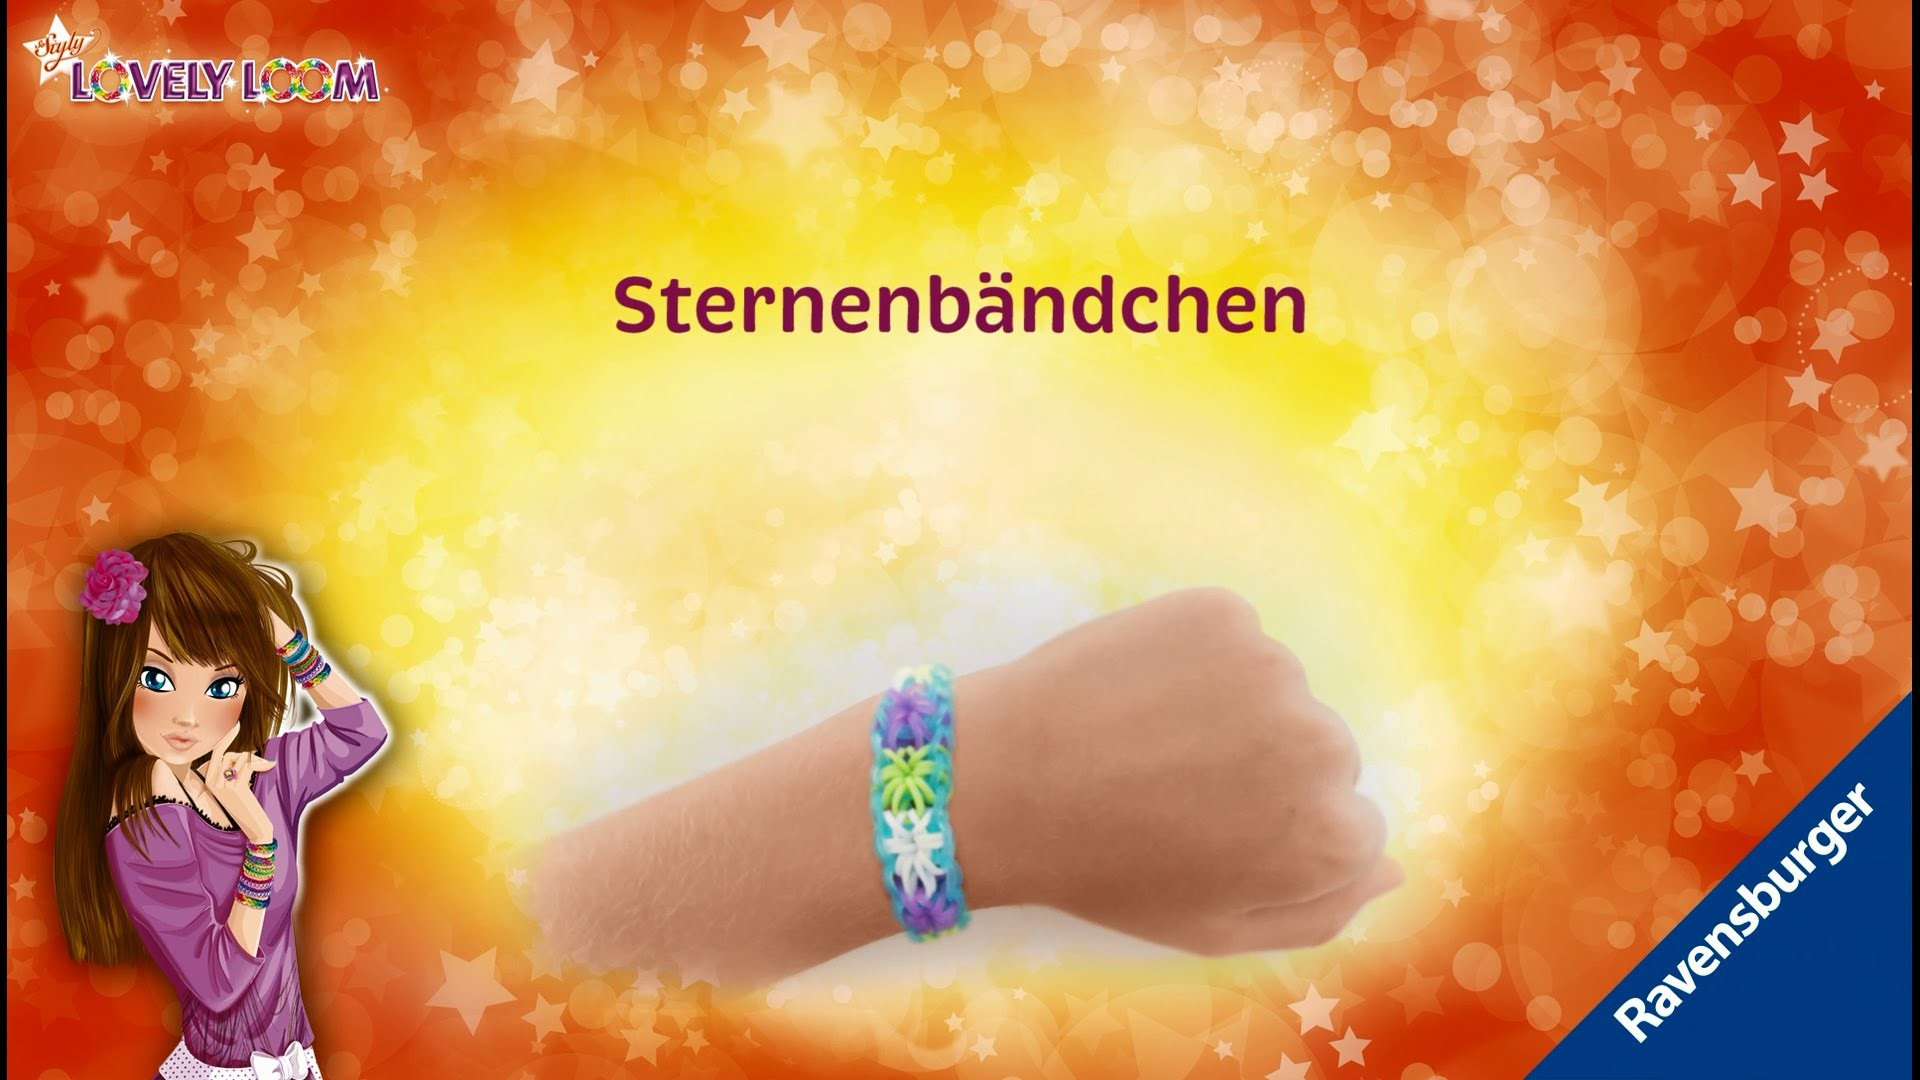 So Styly: Lovely Loom - Sternenbändchen - Video-Anleitung